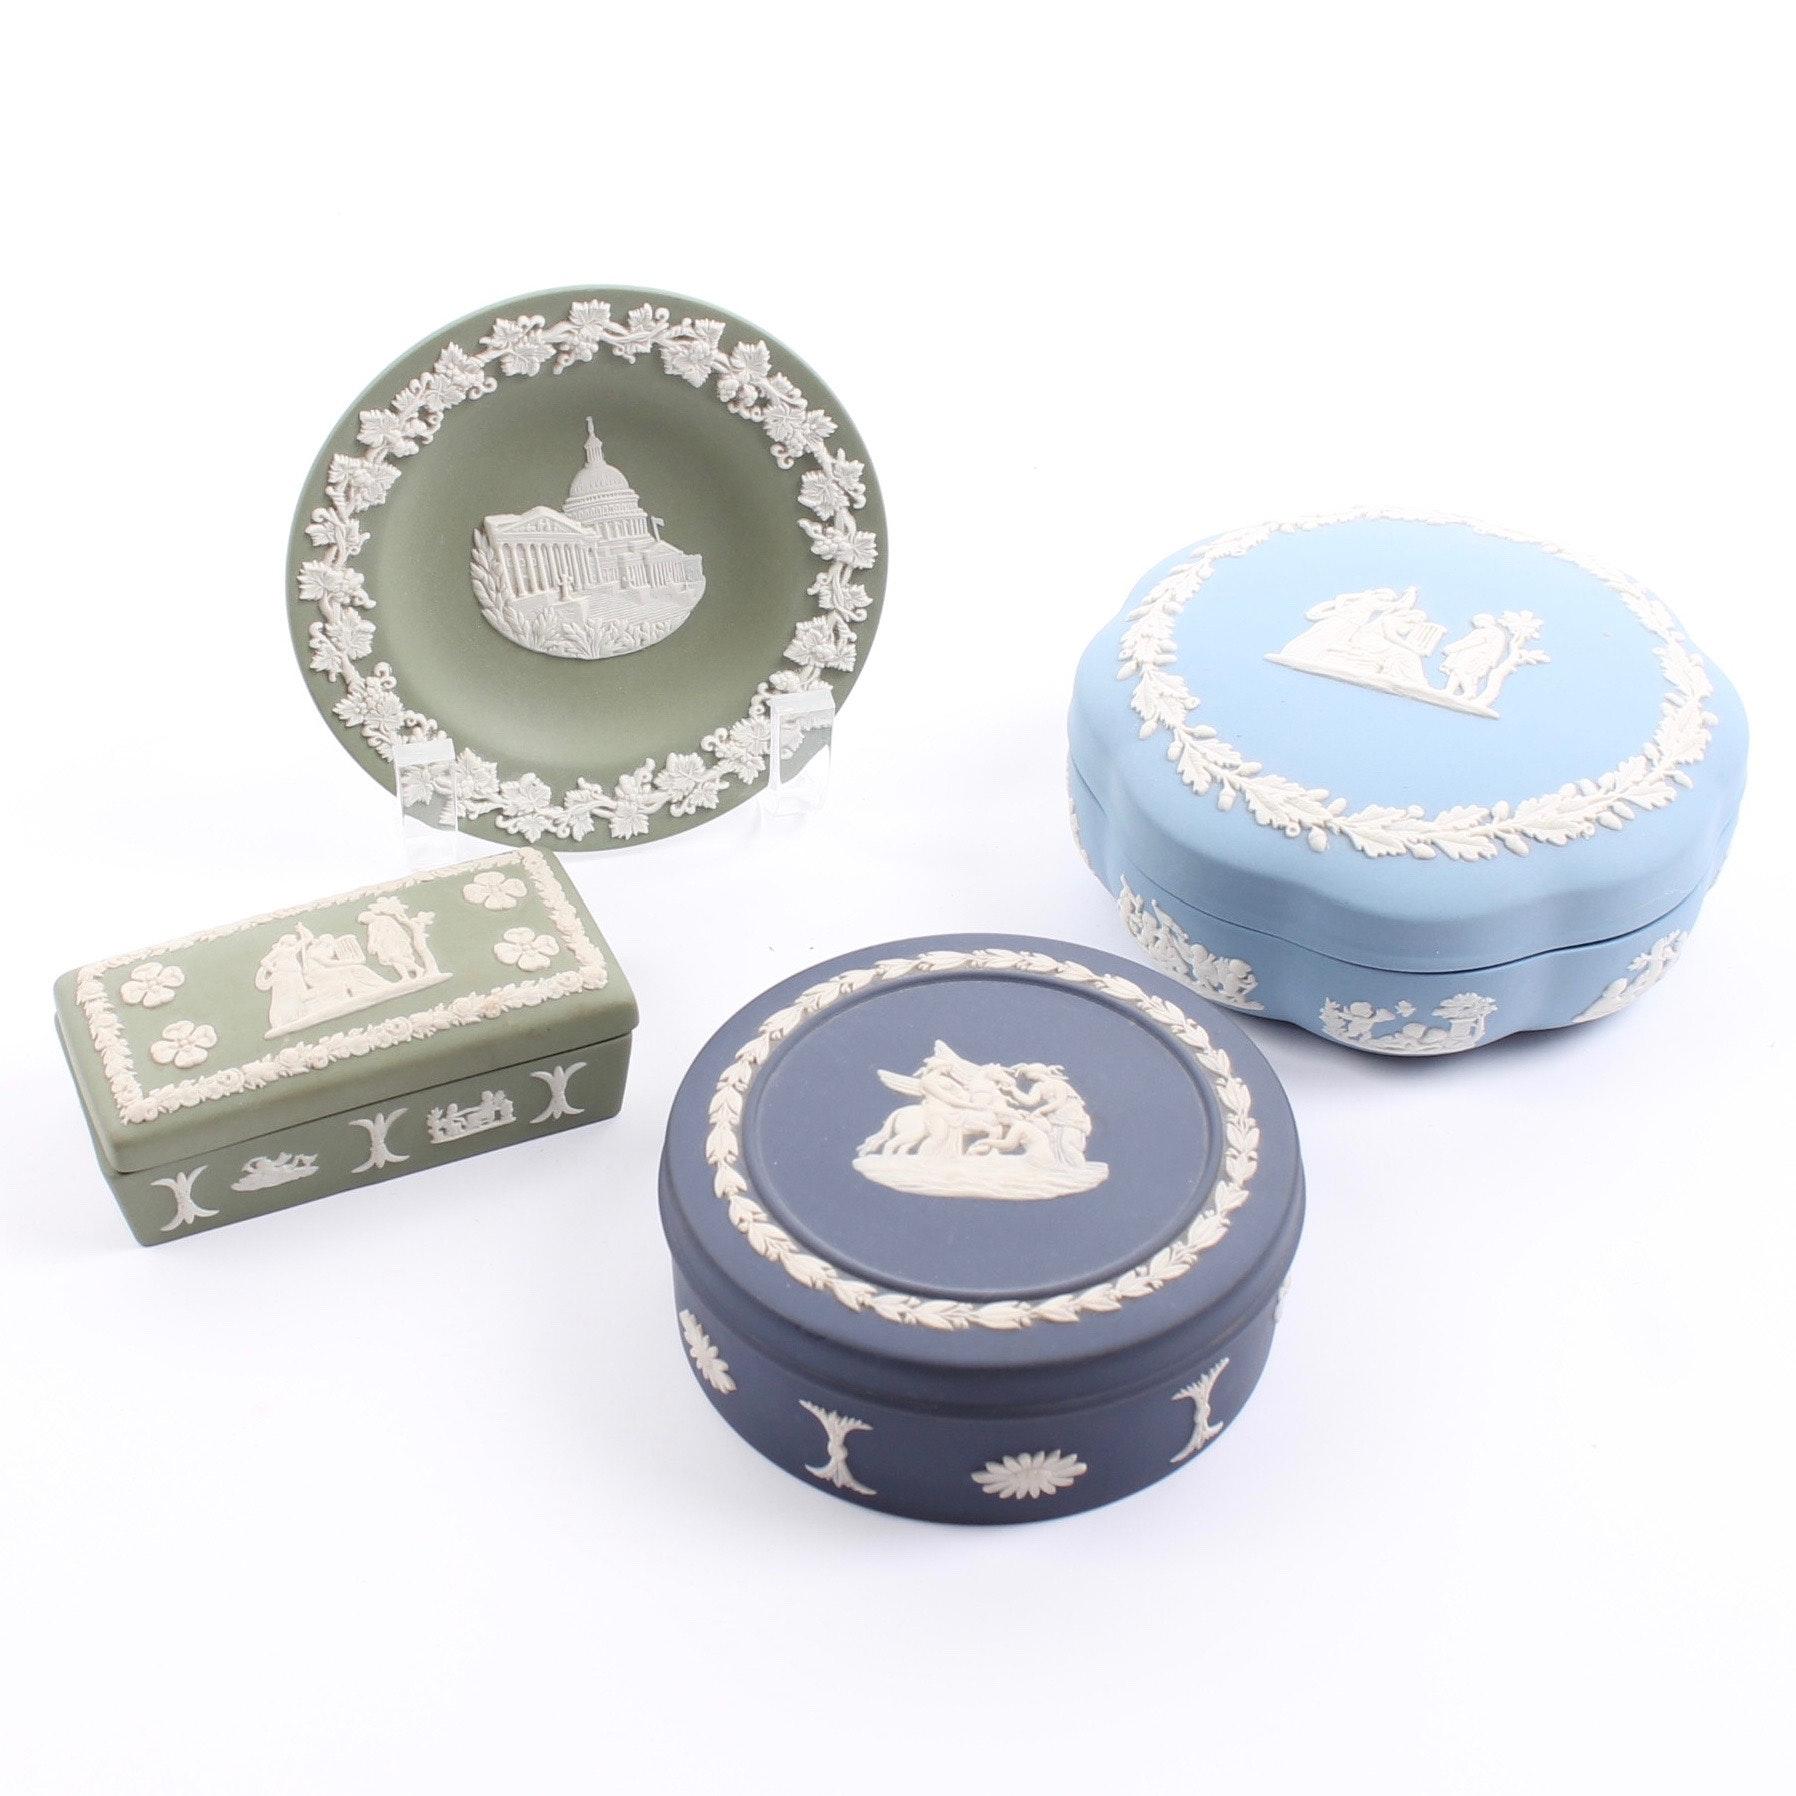 Wedgwood Jasperware Trinket Boxes and Pin Dish